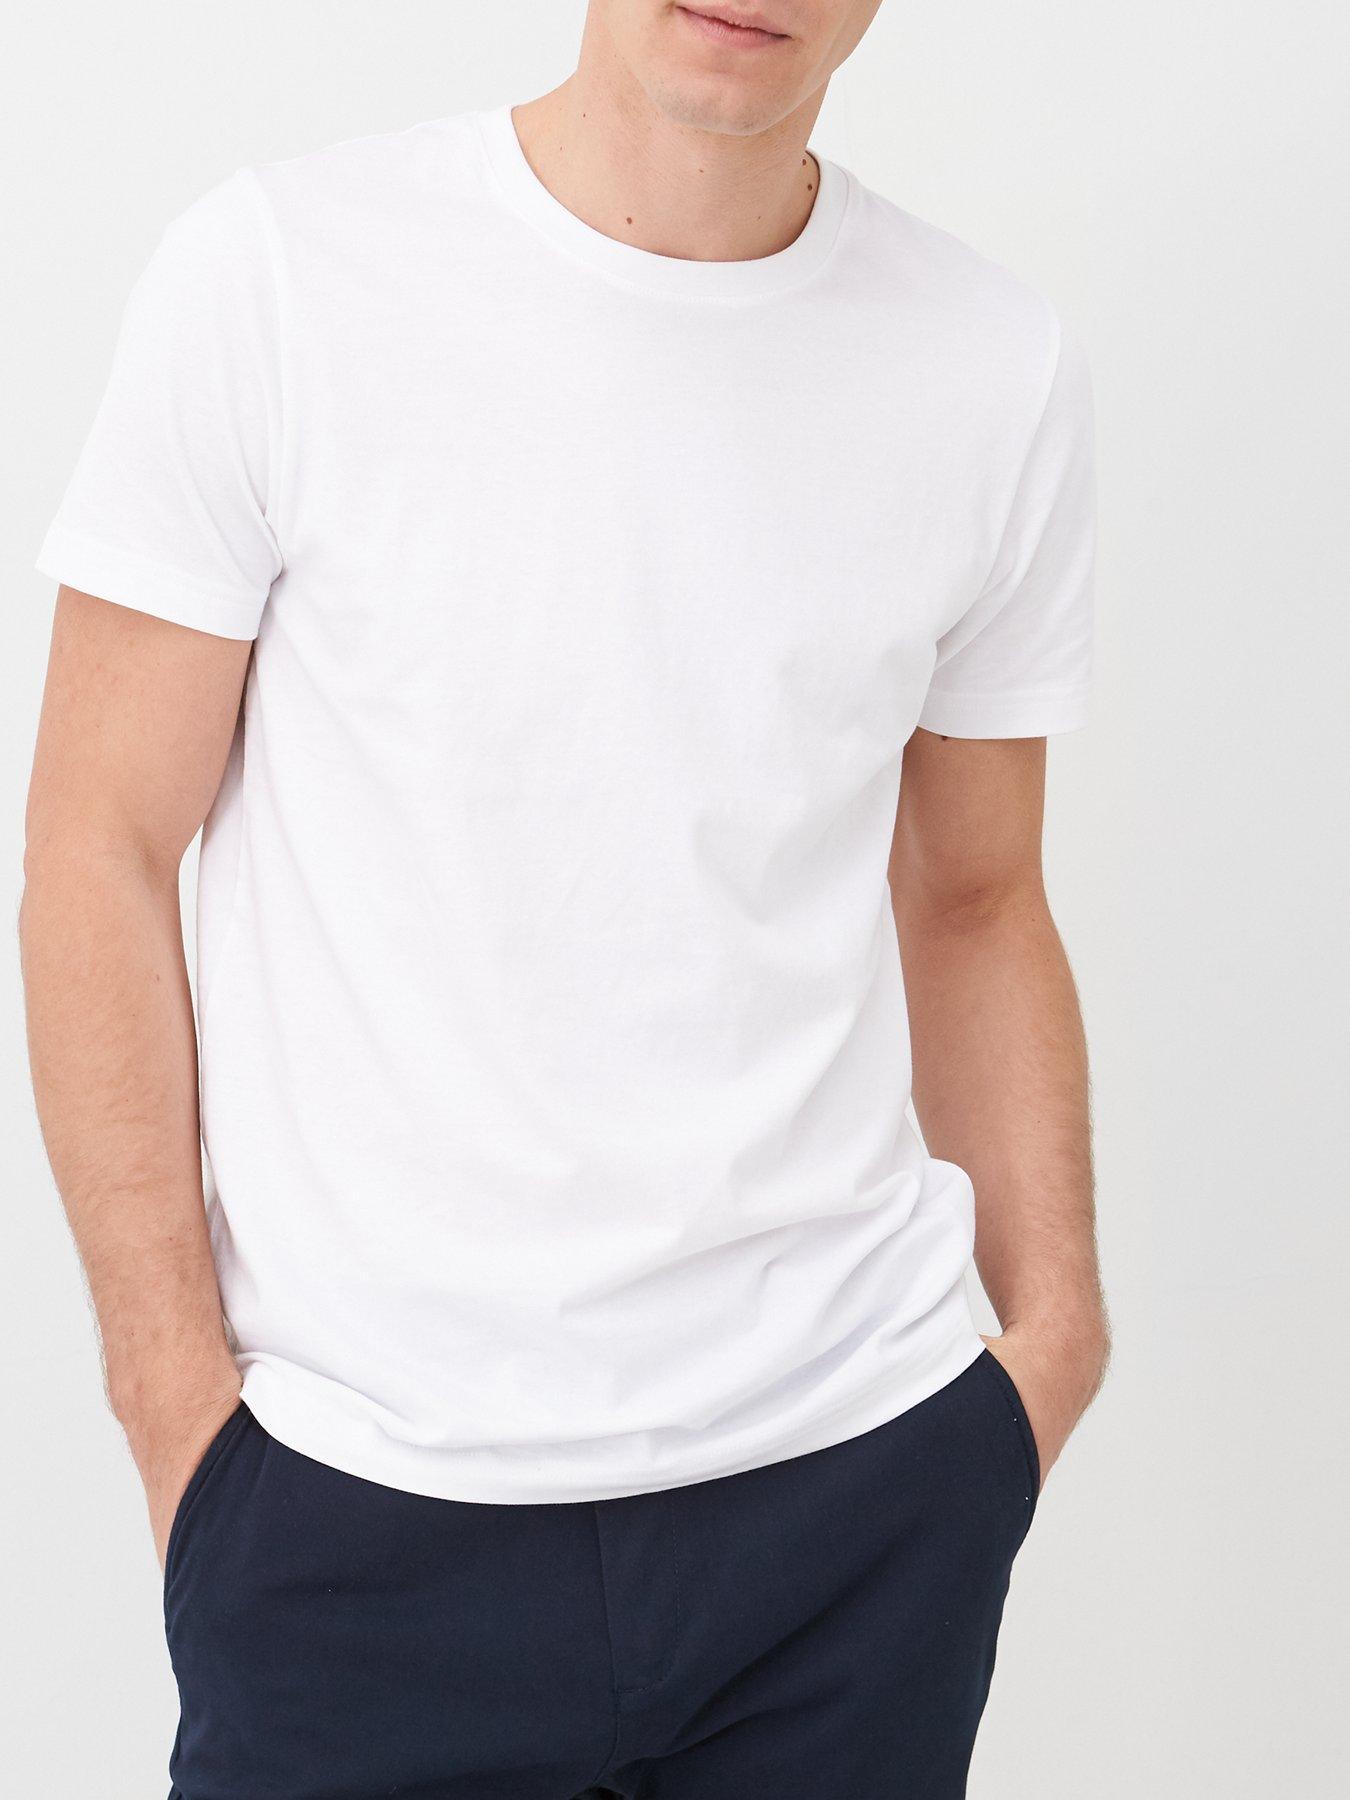 Men 100/% Pure Silk T-Shirt Top Knitted Leisure Crew Neck Shirts Long Sleeve Soft